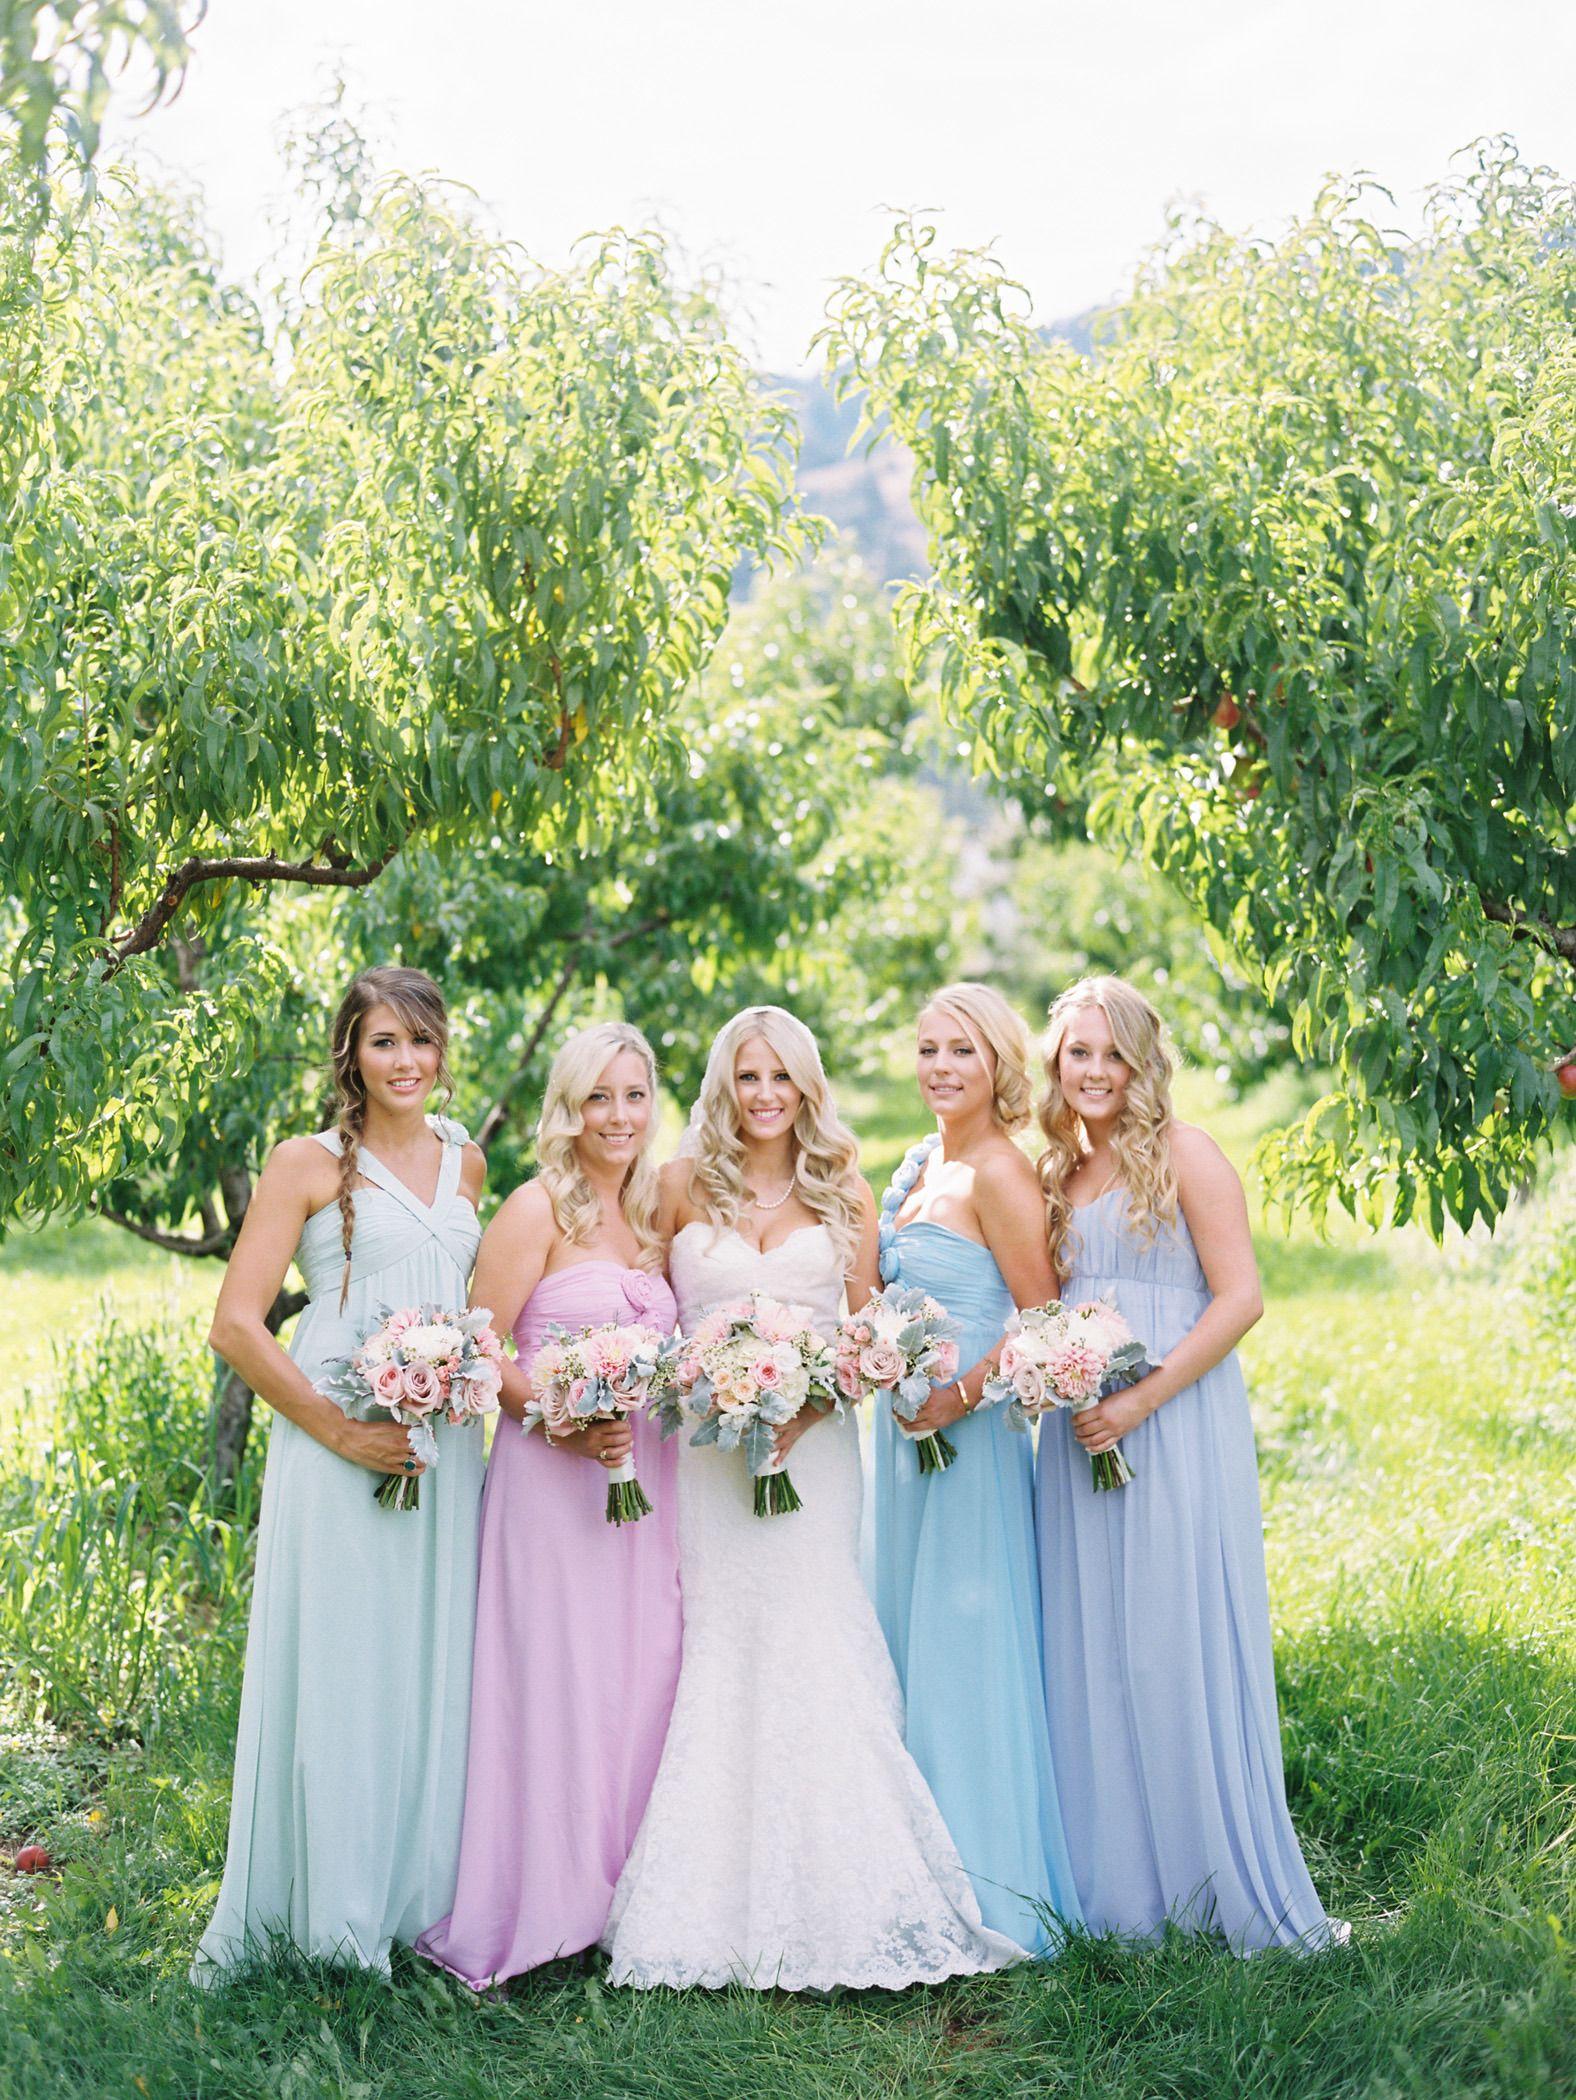 Pretty pastel wedding details colour list favorite color and style me pretty pastel bridesmaid dresses ombrellifo Image collections